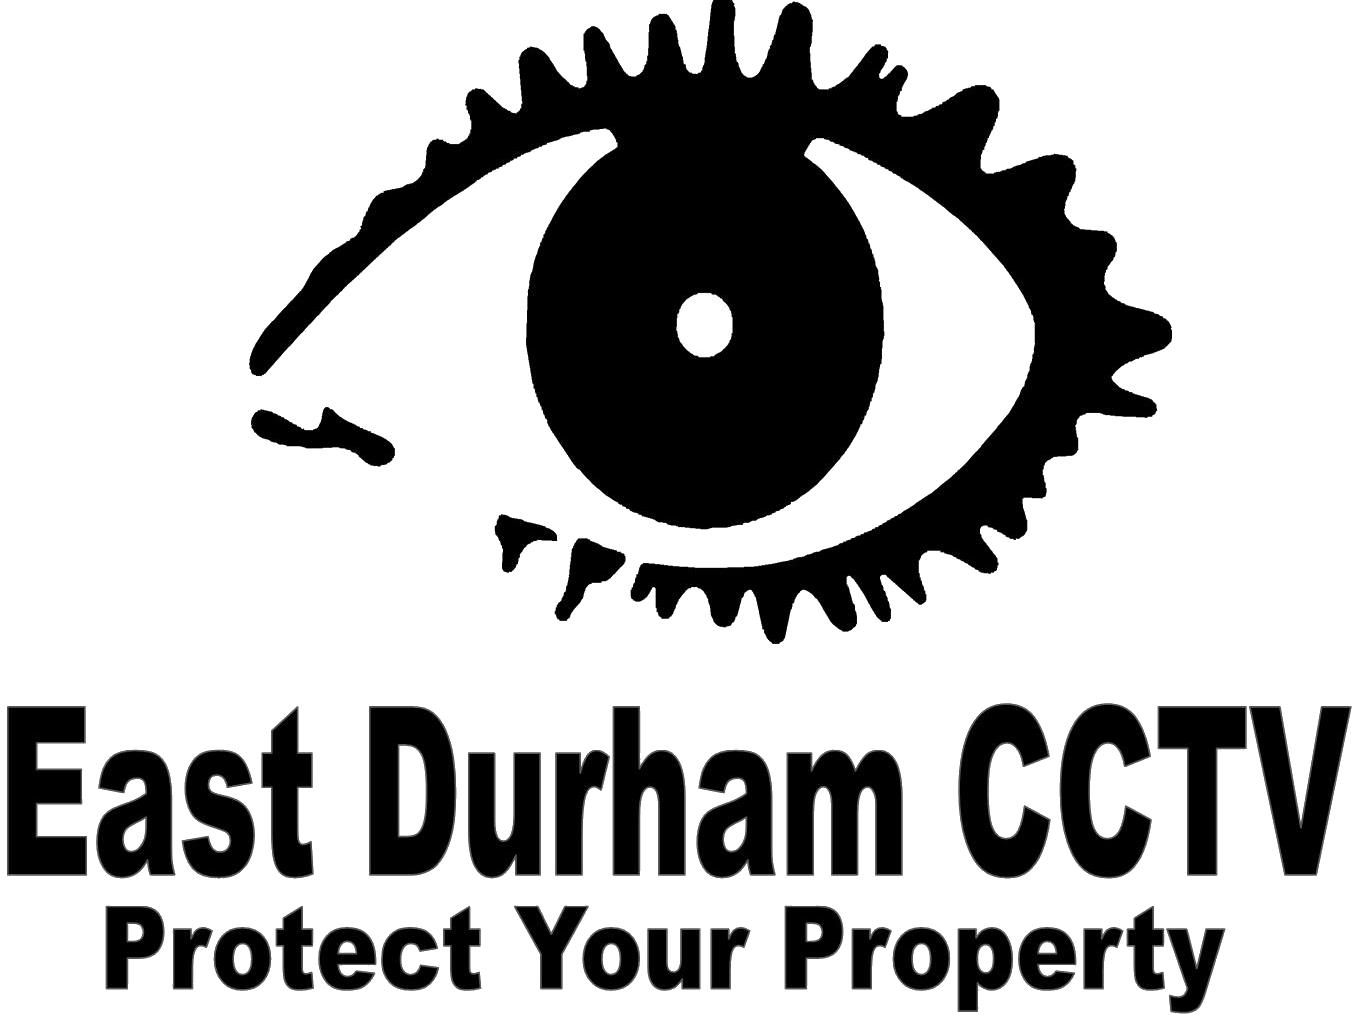 East Durham CCTV